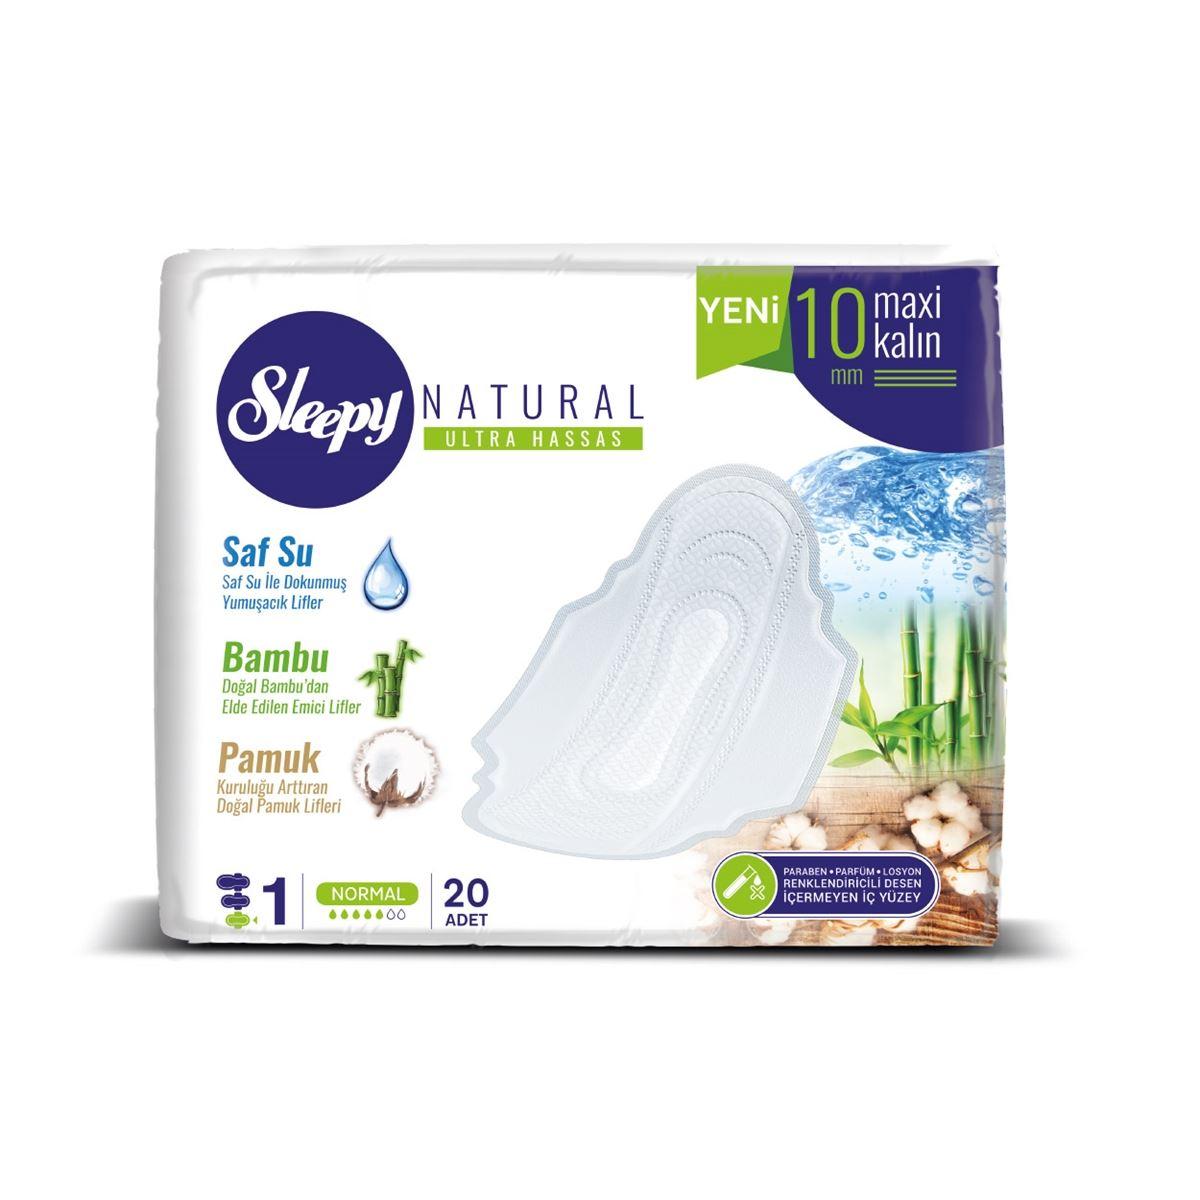 Sleepy Natural Ultra Hassas Maxi Kalın NORMAL (20 Ped) SÜPER EKO